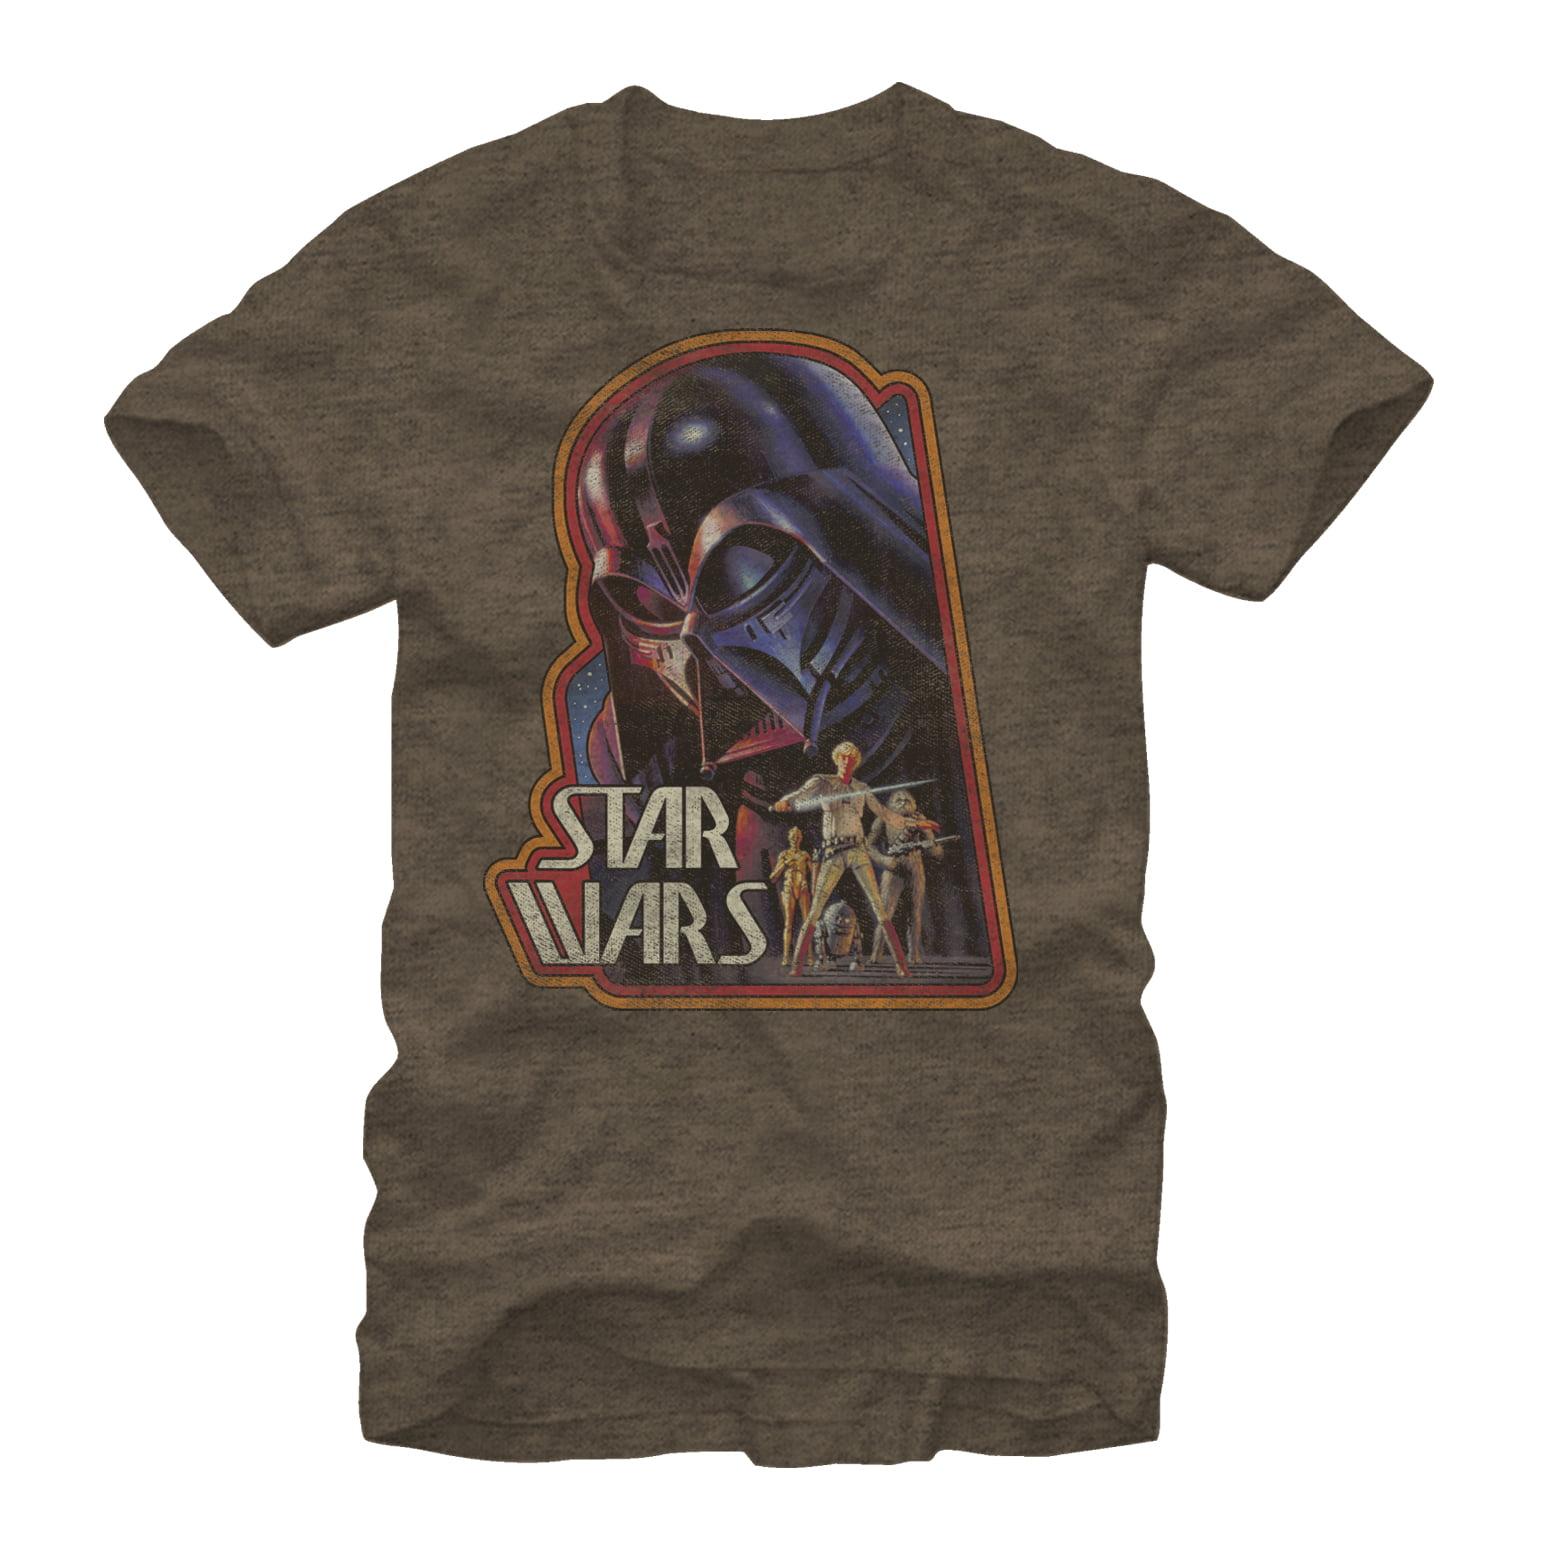 Star Wars Men's Ralph McQuarrie Darth Vader T-Shirt